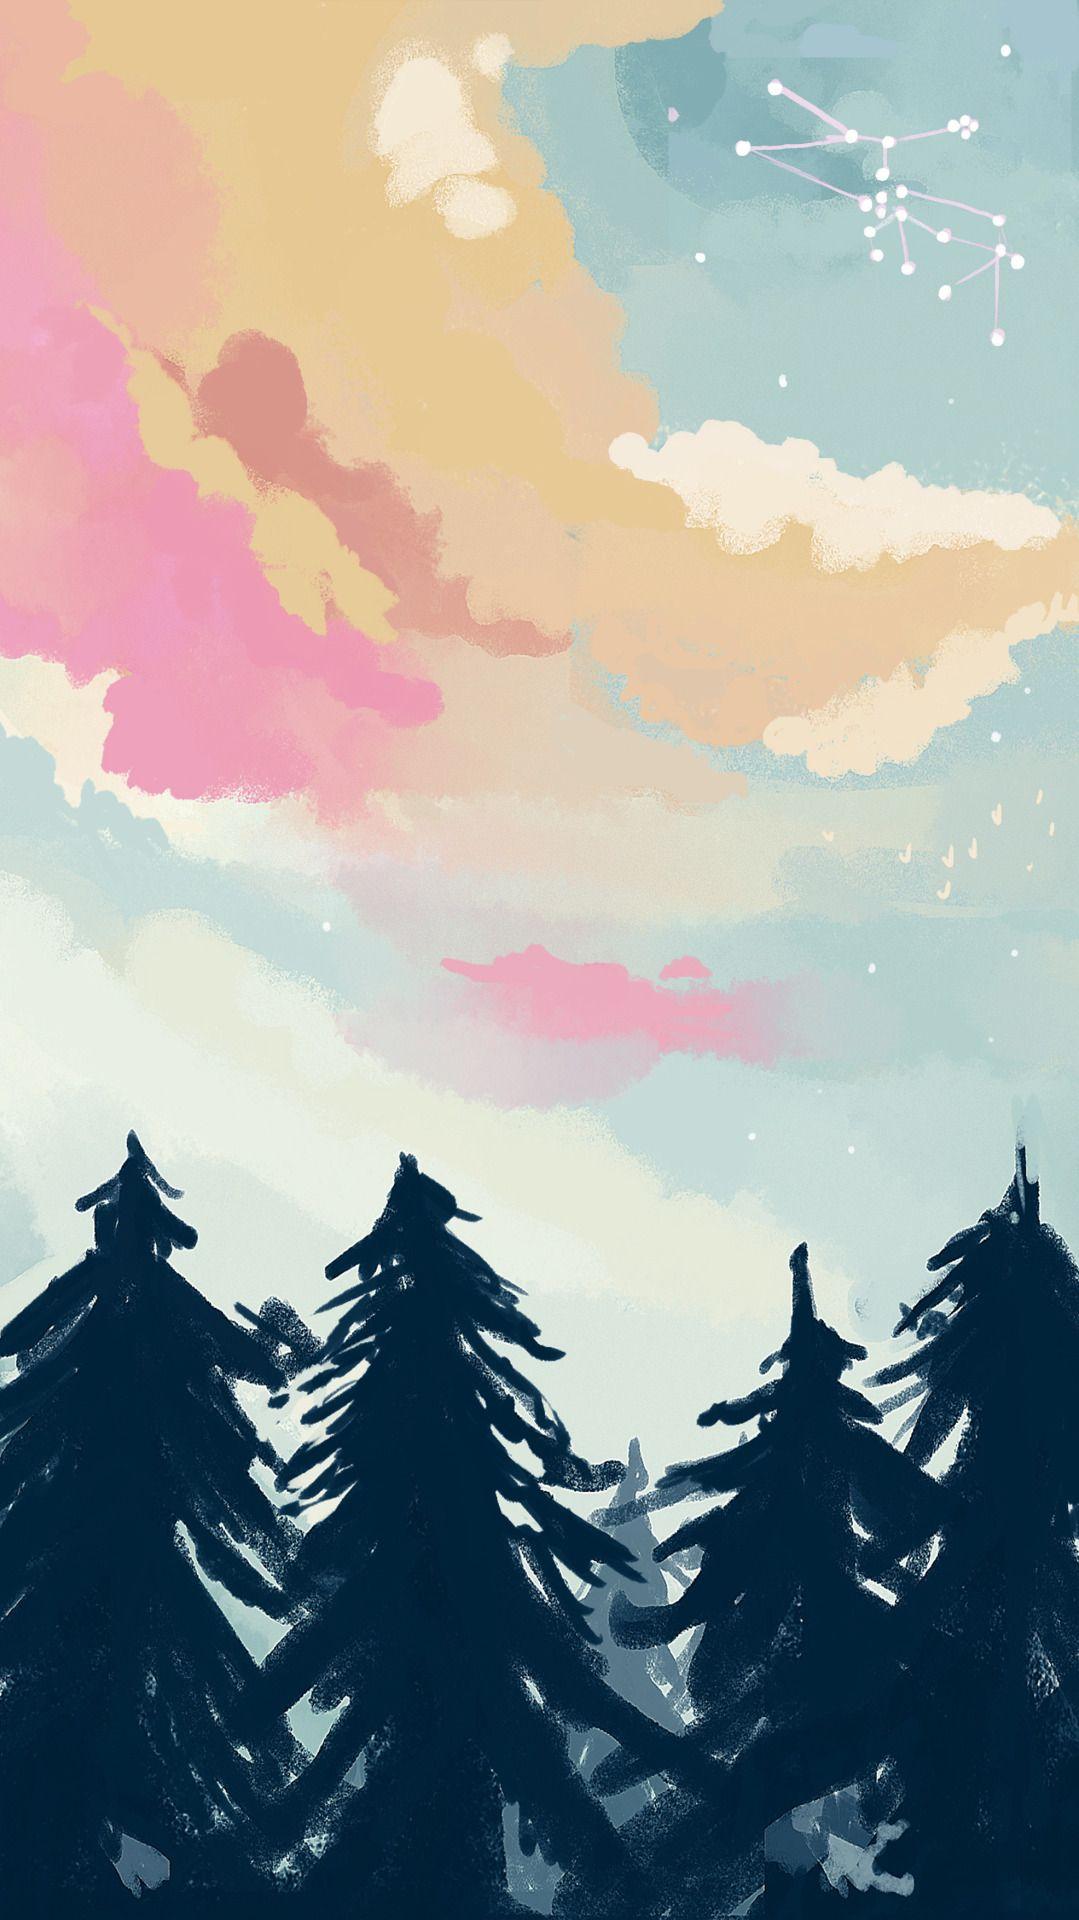 Prettybittersweet Sagittarius Wallpaper Tumblr Wallpaper Ipod Wallpaper